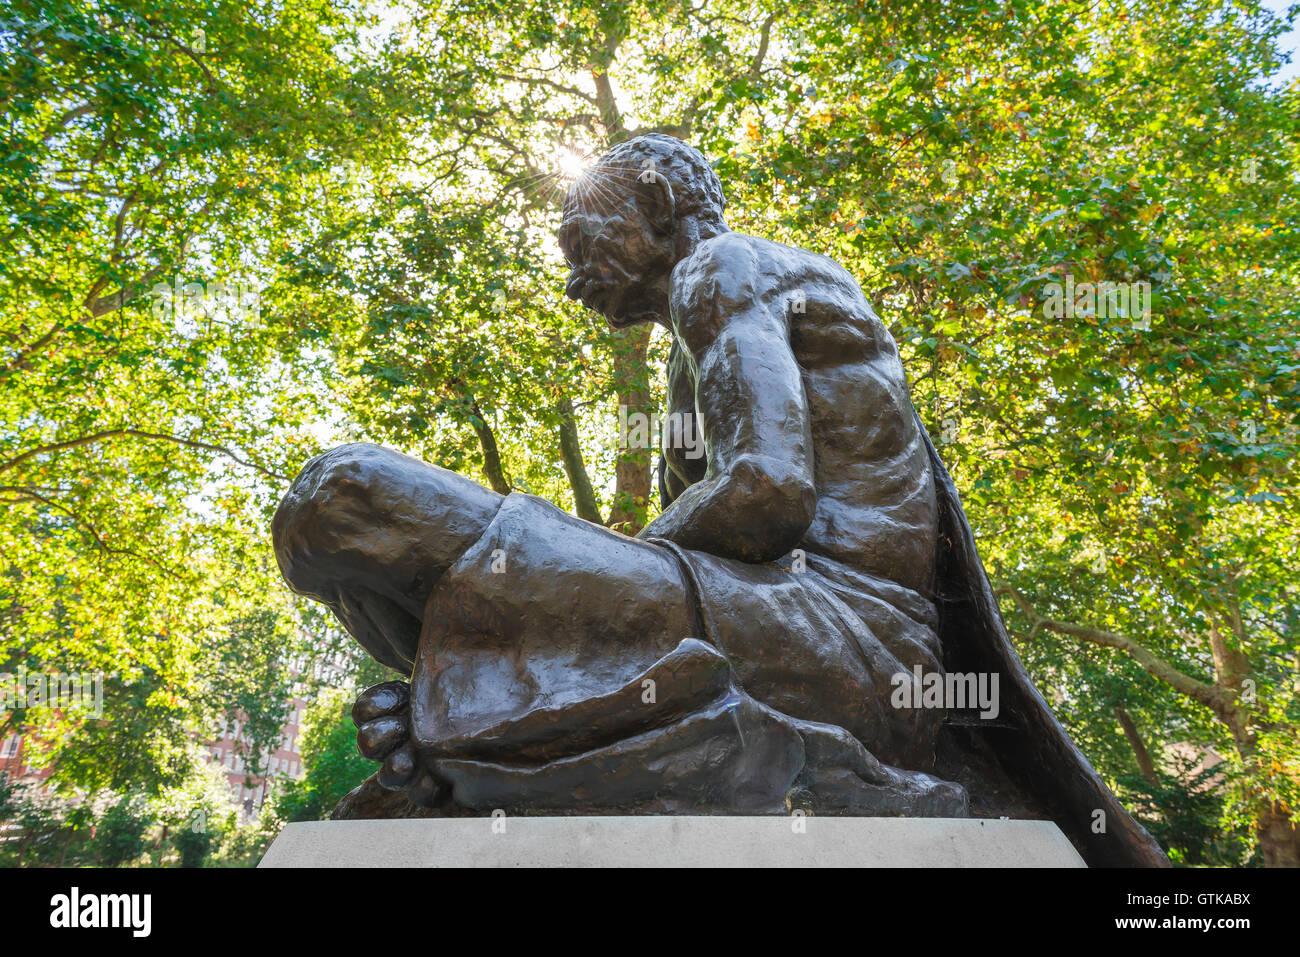 Gandhi statue London, statue of Mahatma Gandhi in Tavistock Square, Bloomsbury, London, UK. - Stock Image